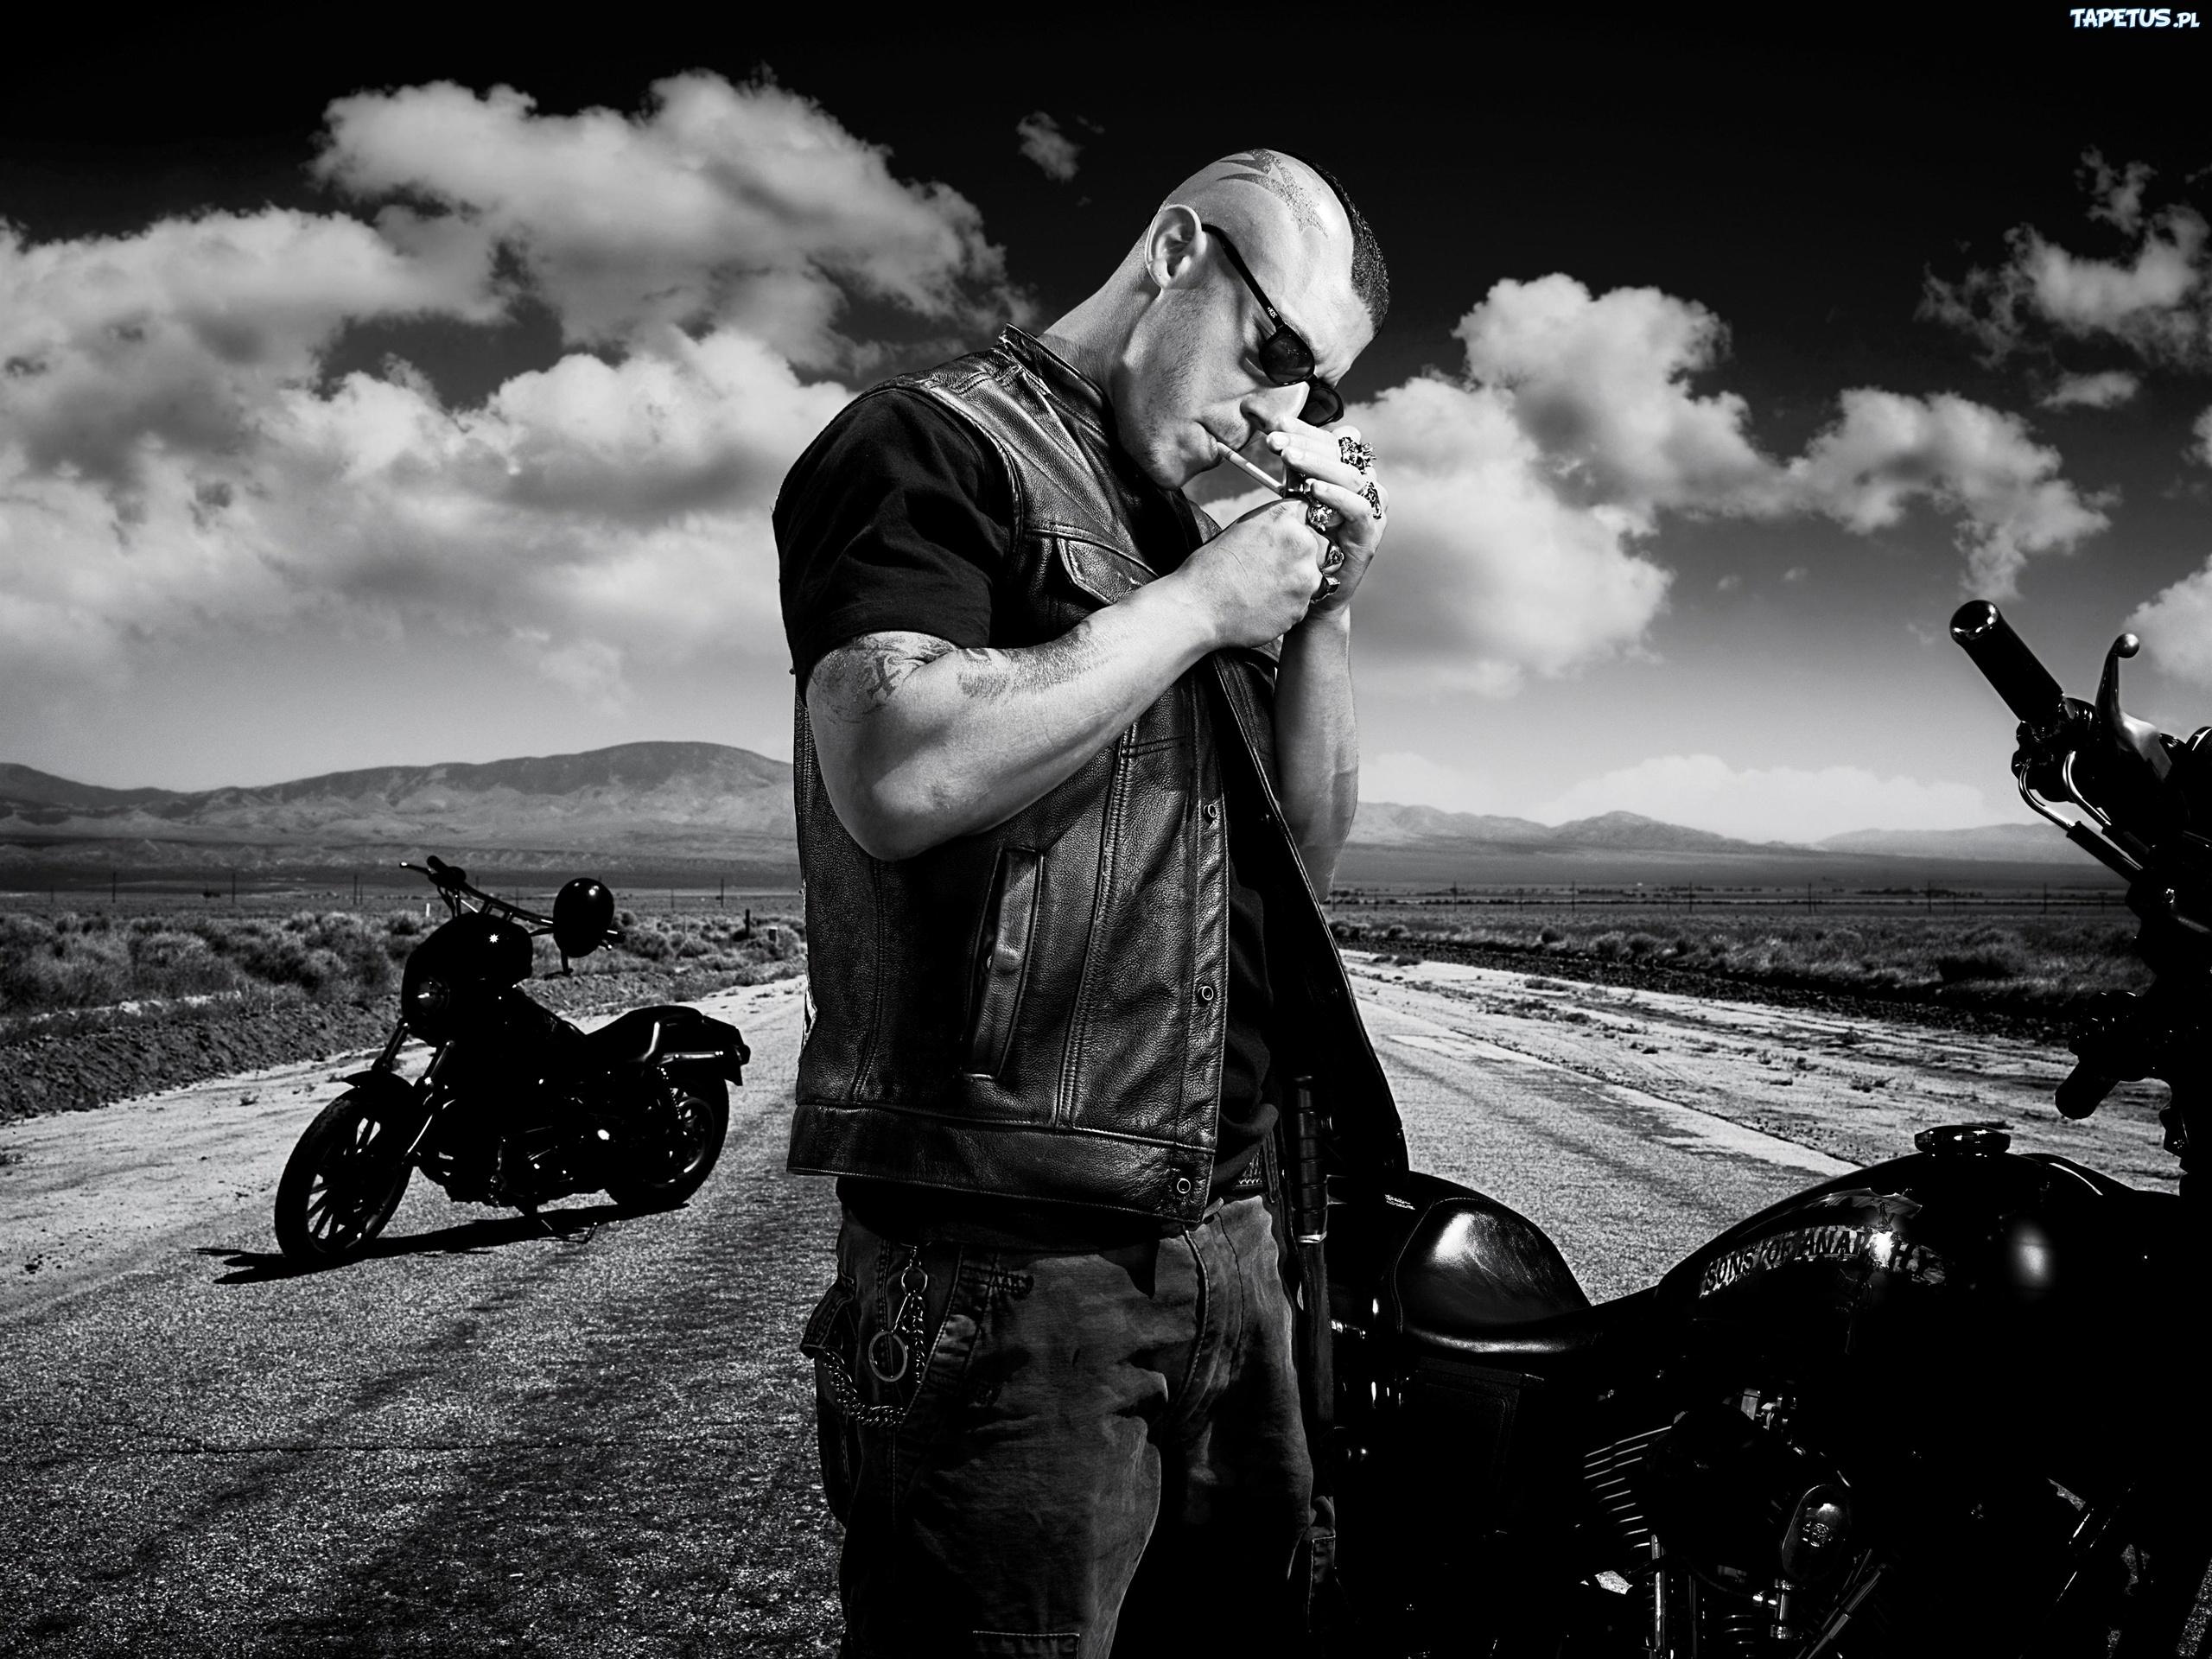 anarchy sunglasses  motory, droga